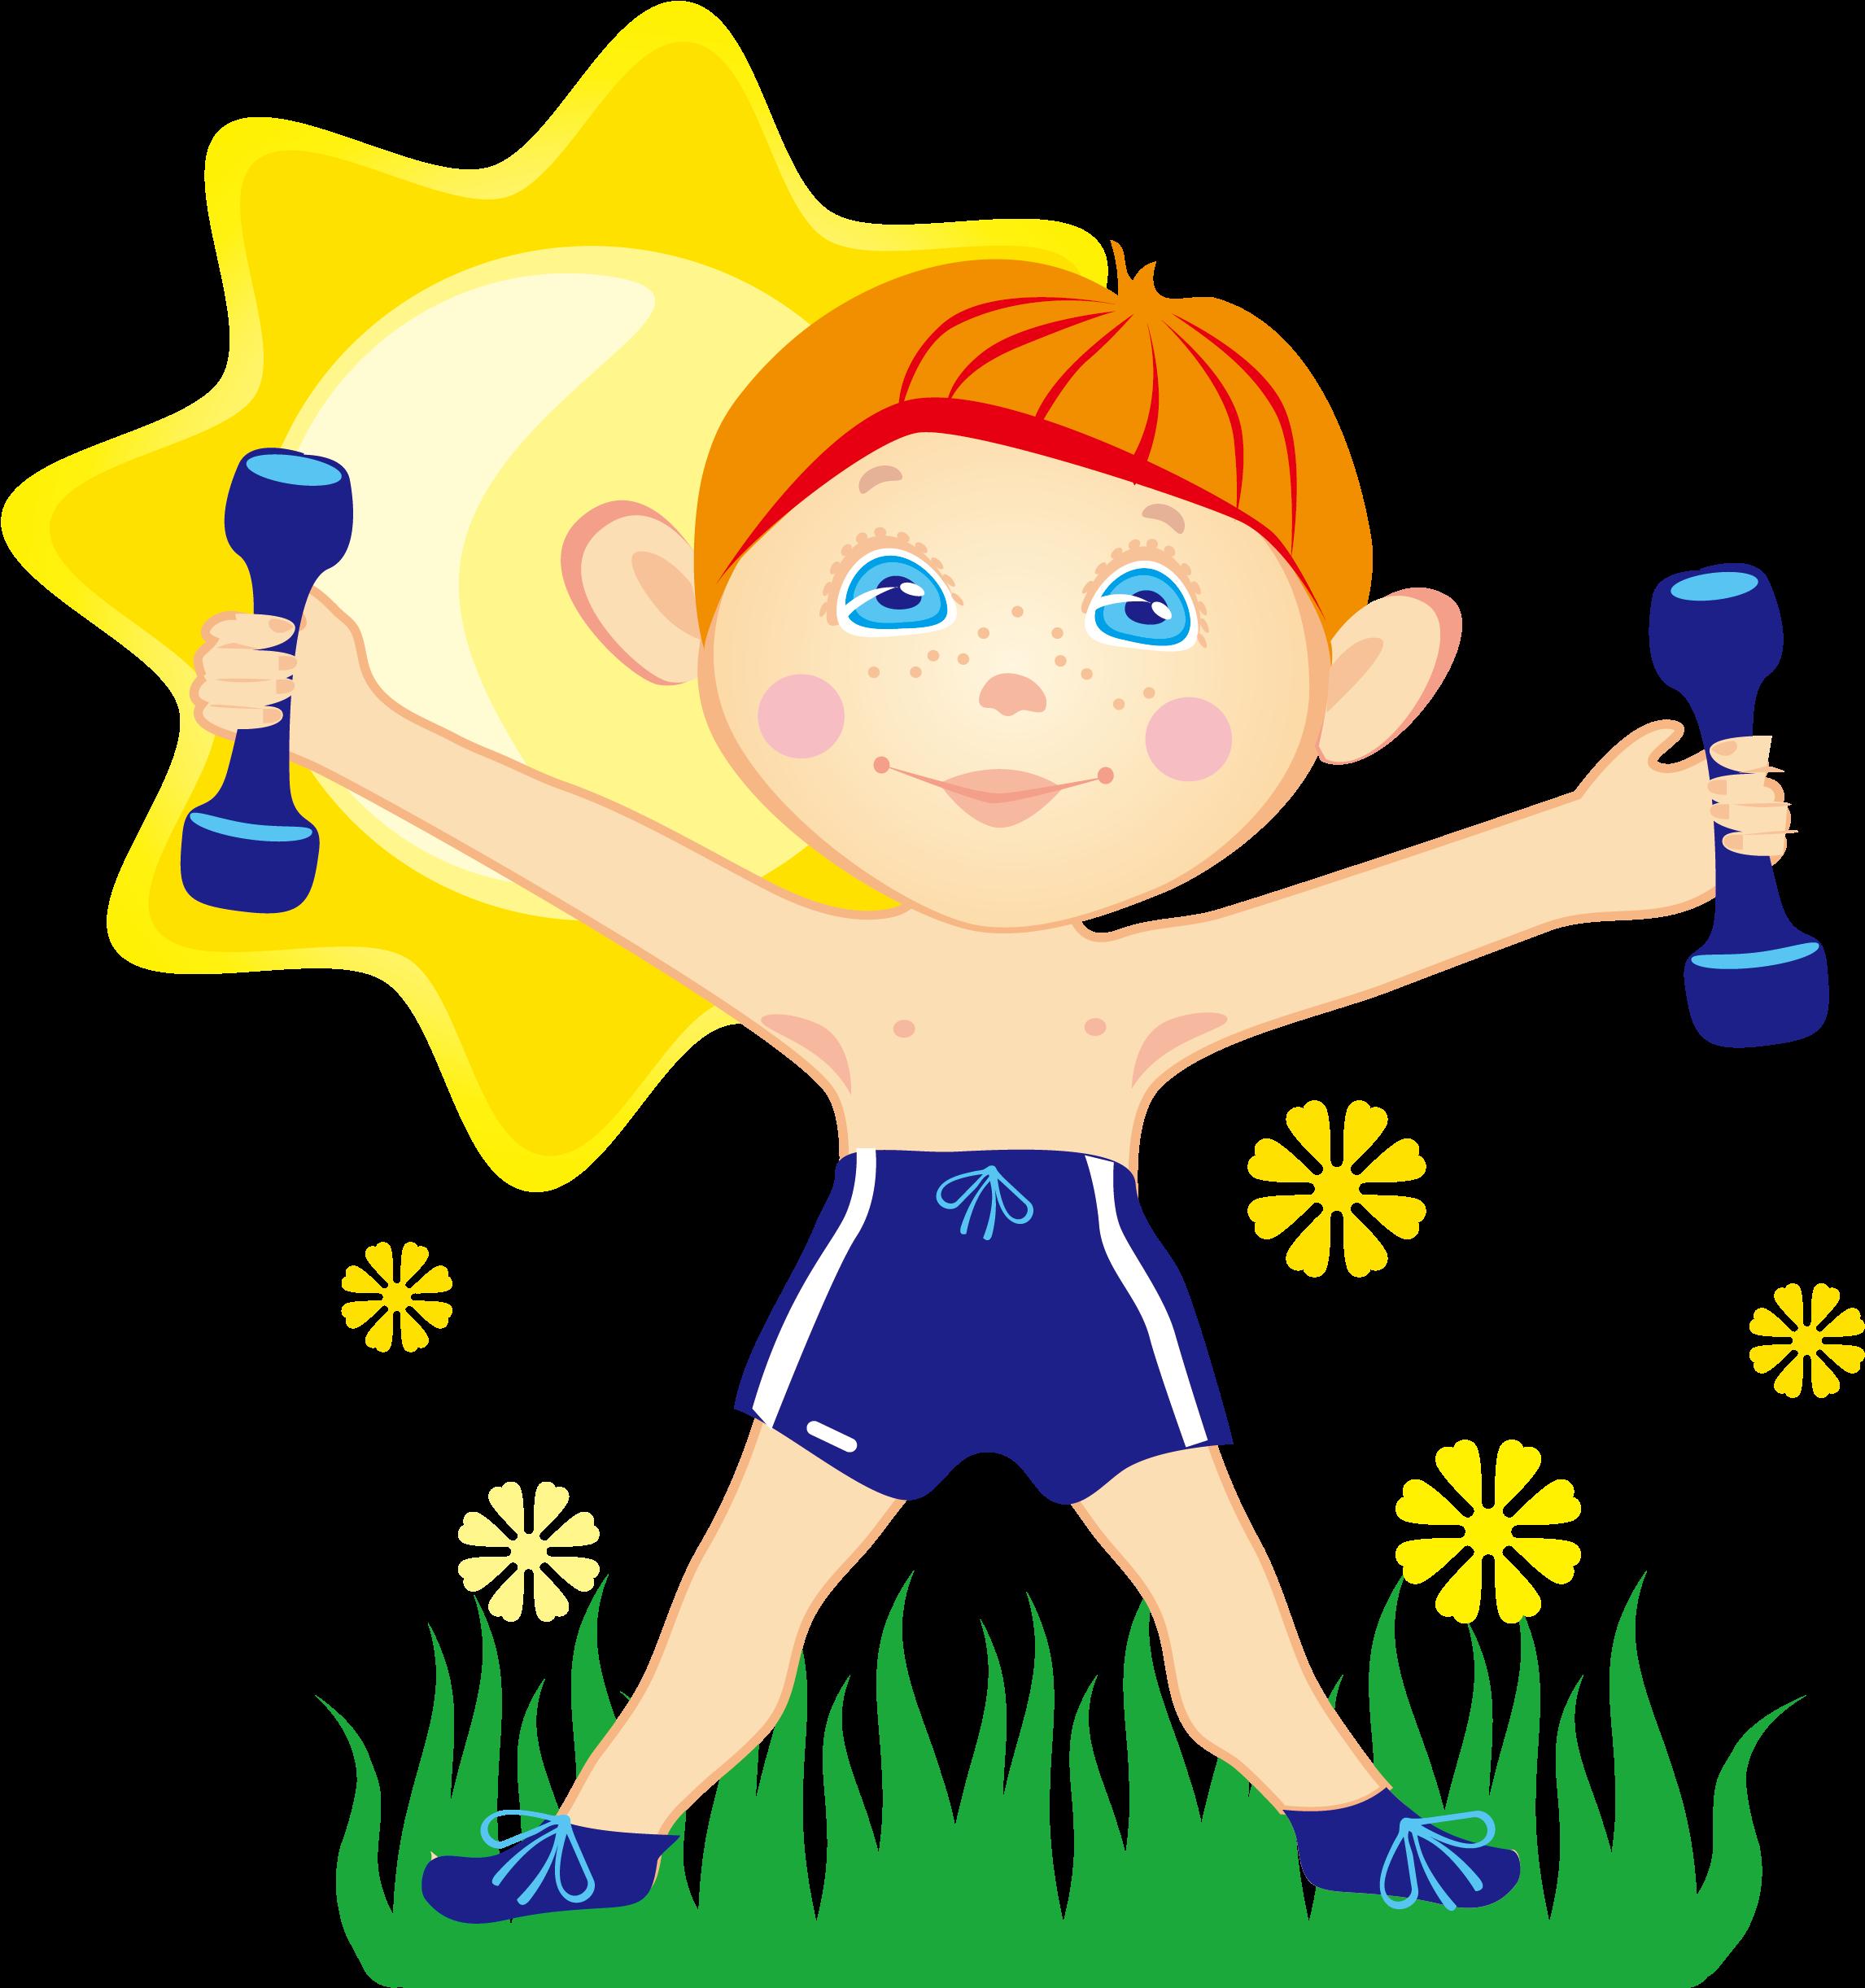 Детская картинка гимнастика